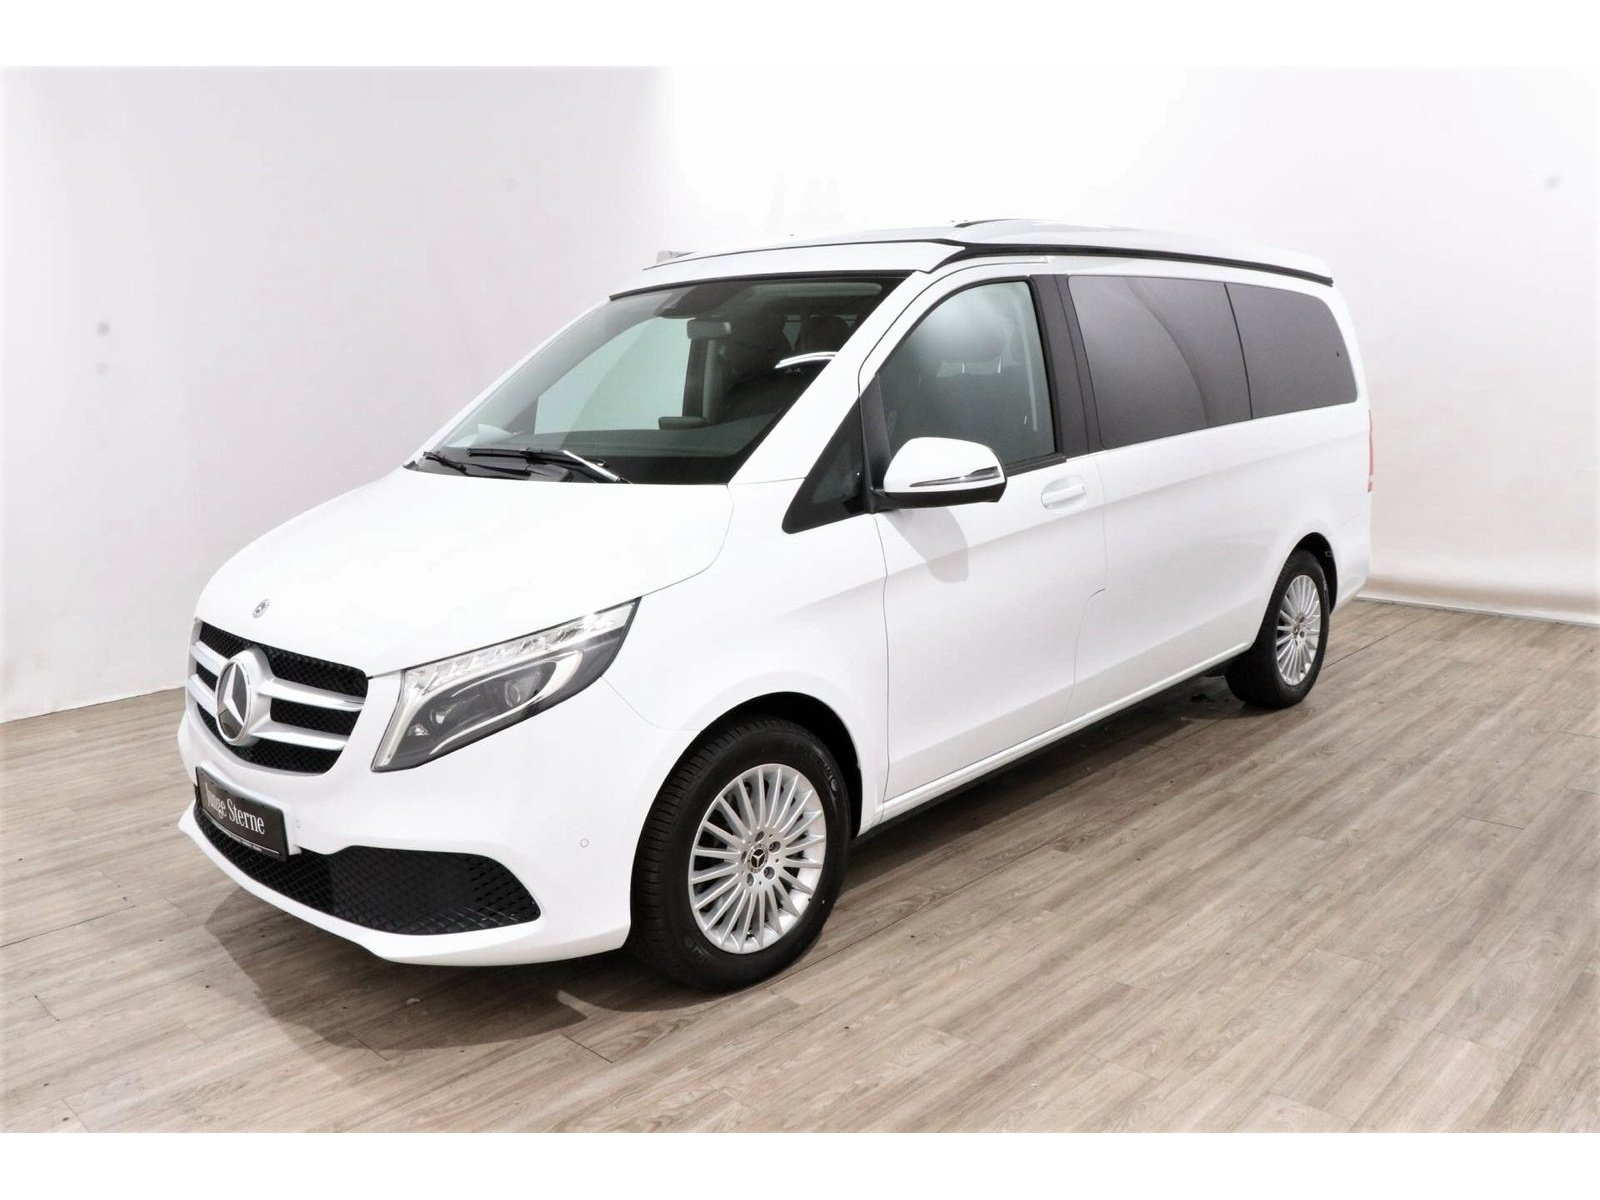 Mercedes-Benz 250 d 4M Marco Polo HORIZON*AHK*Navi*Kamera*Dist, Jahr 2020, Diesel